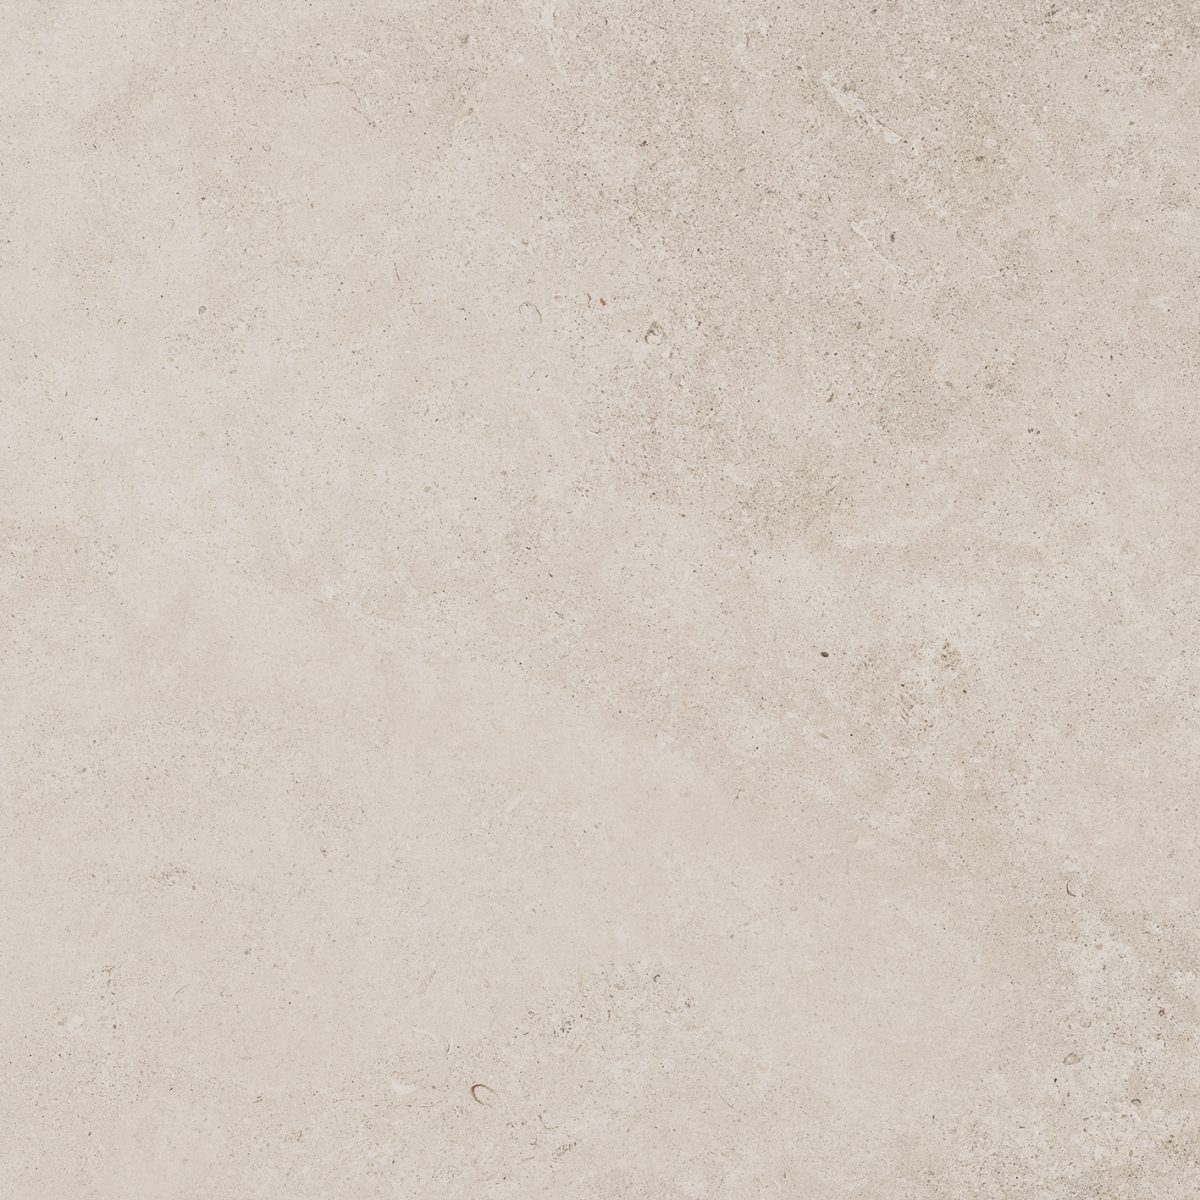 Porcelanosa Berna Caliza 120 x 120 cm